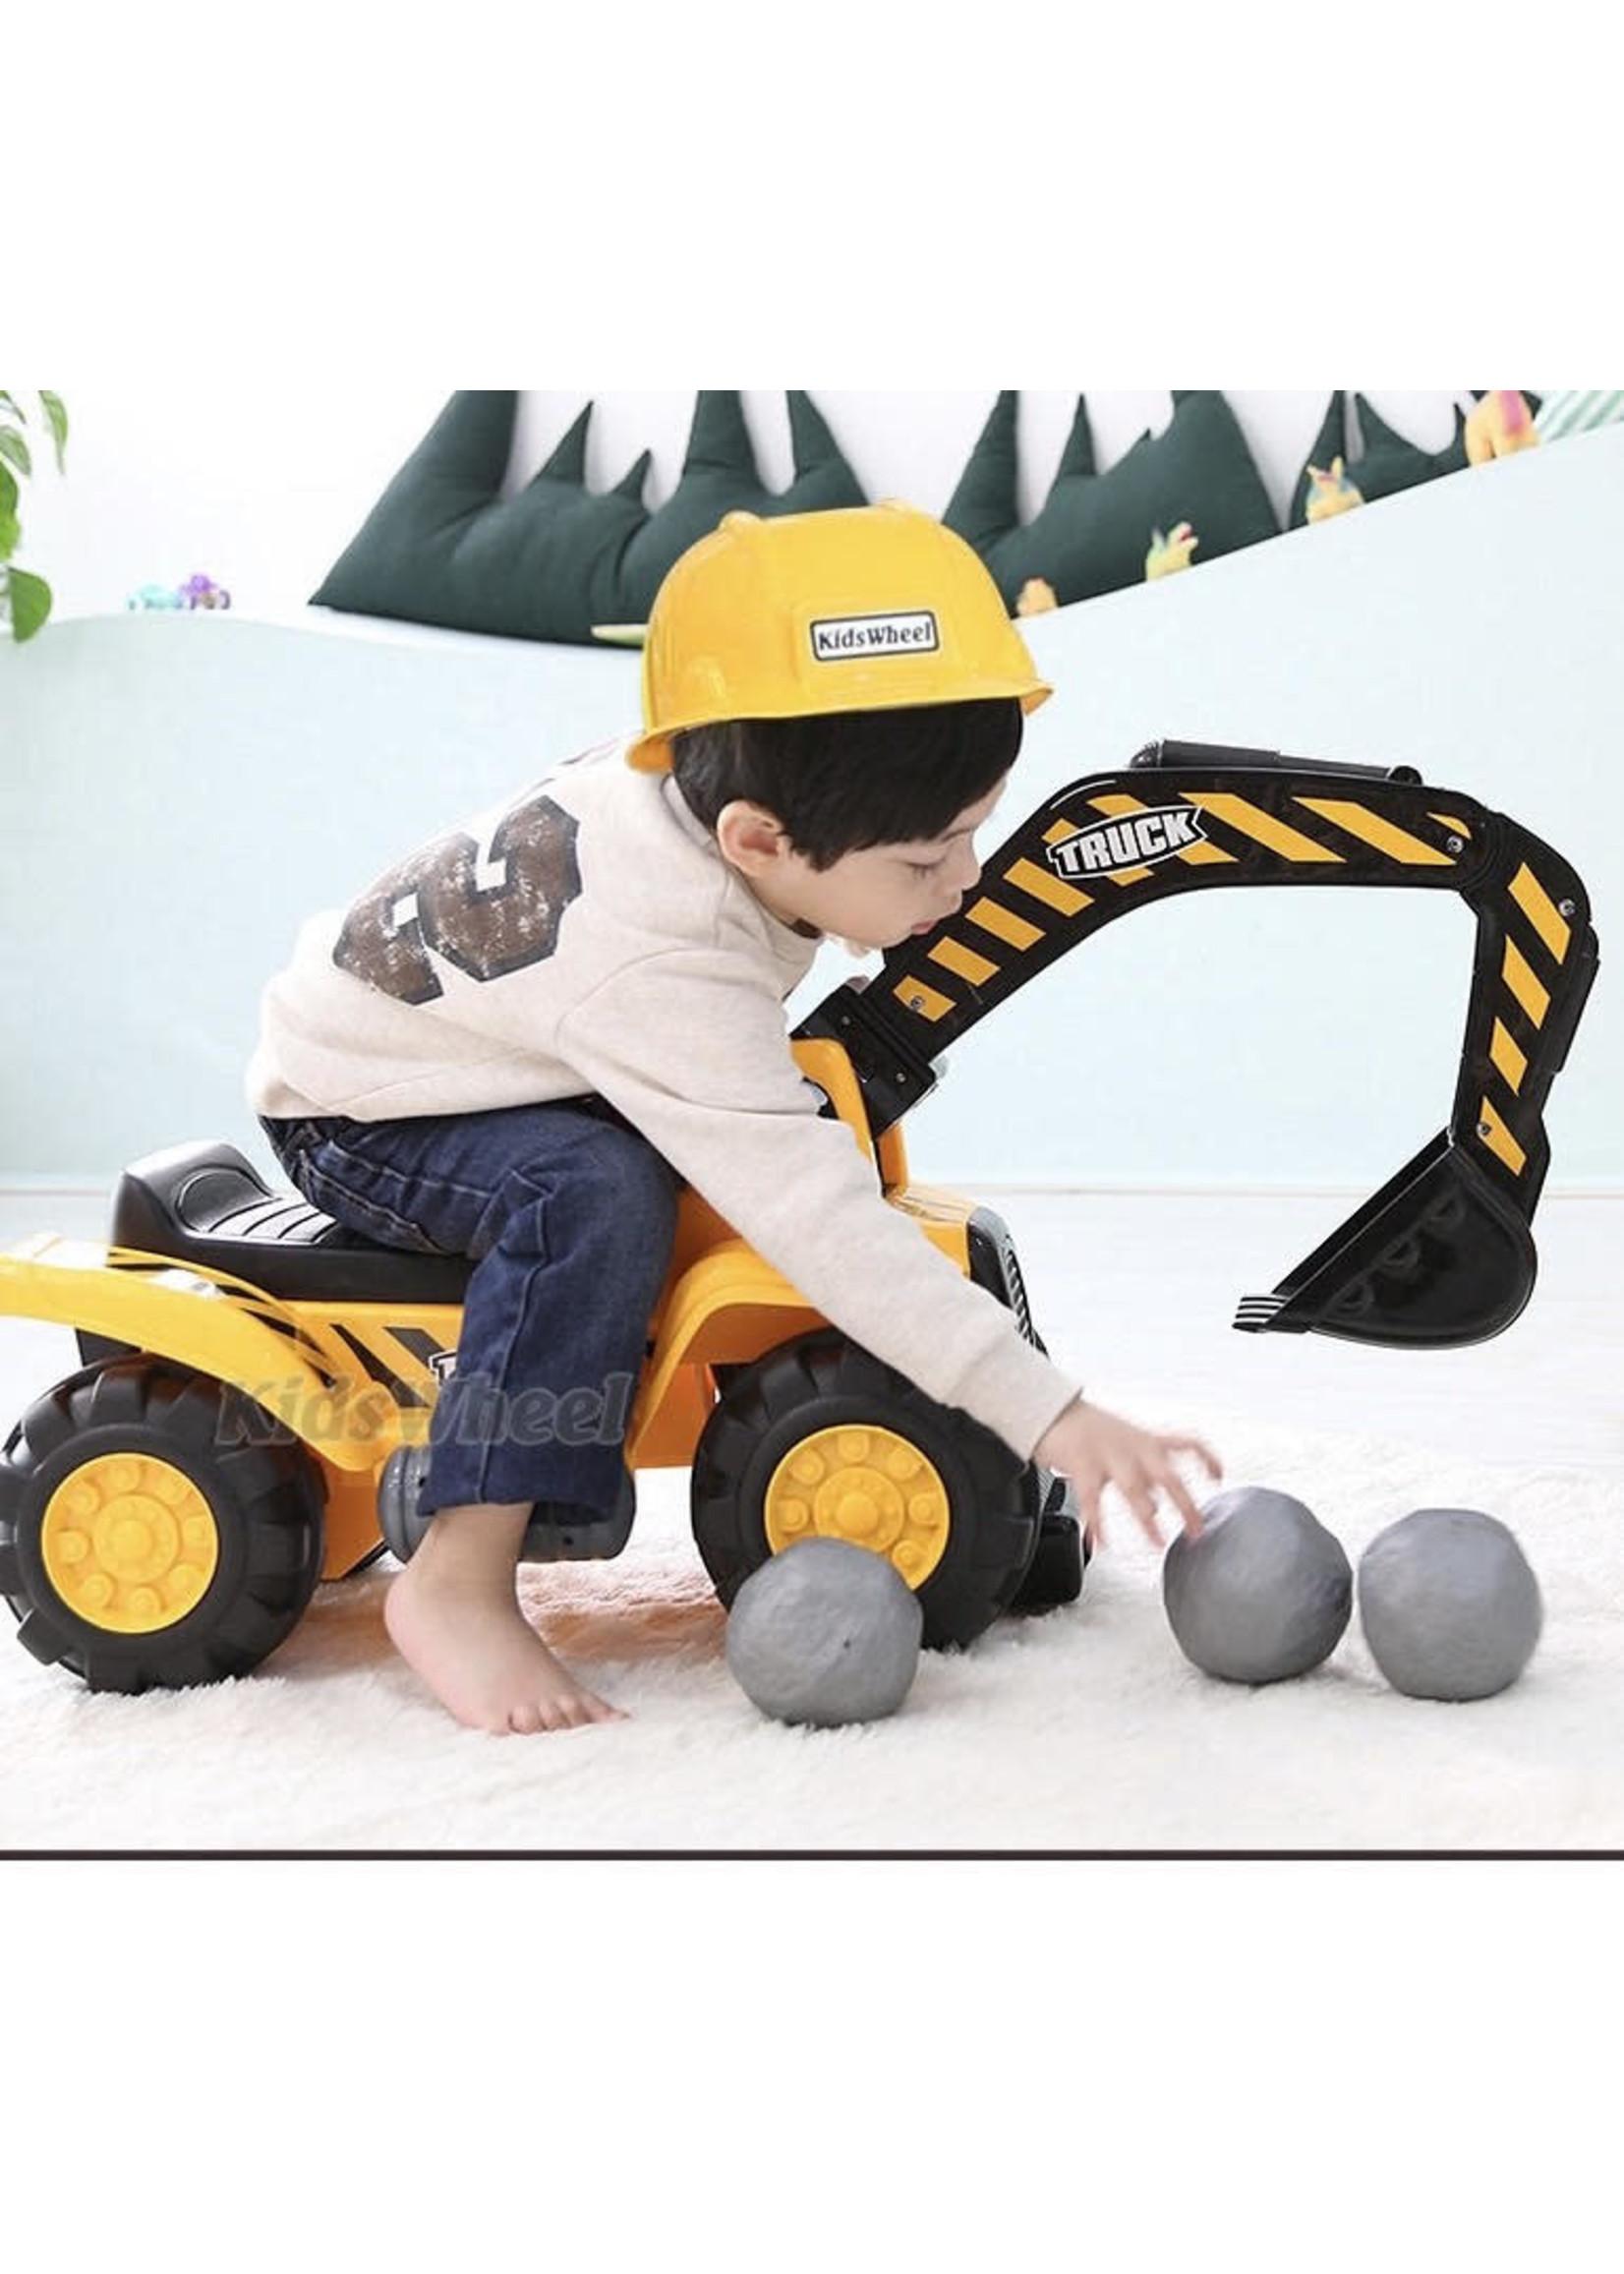 Kids Wheel Digger